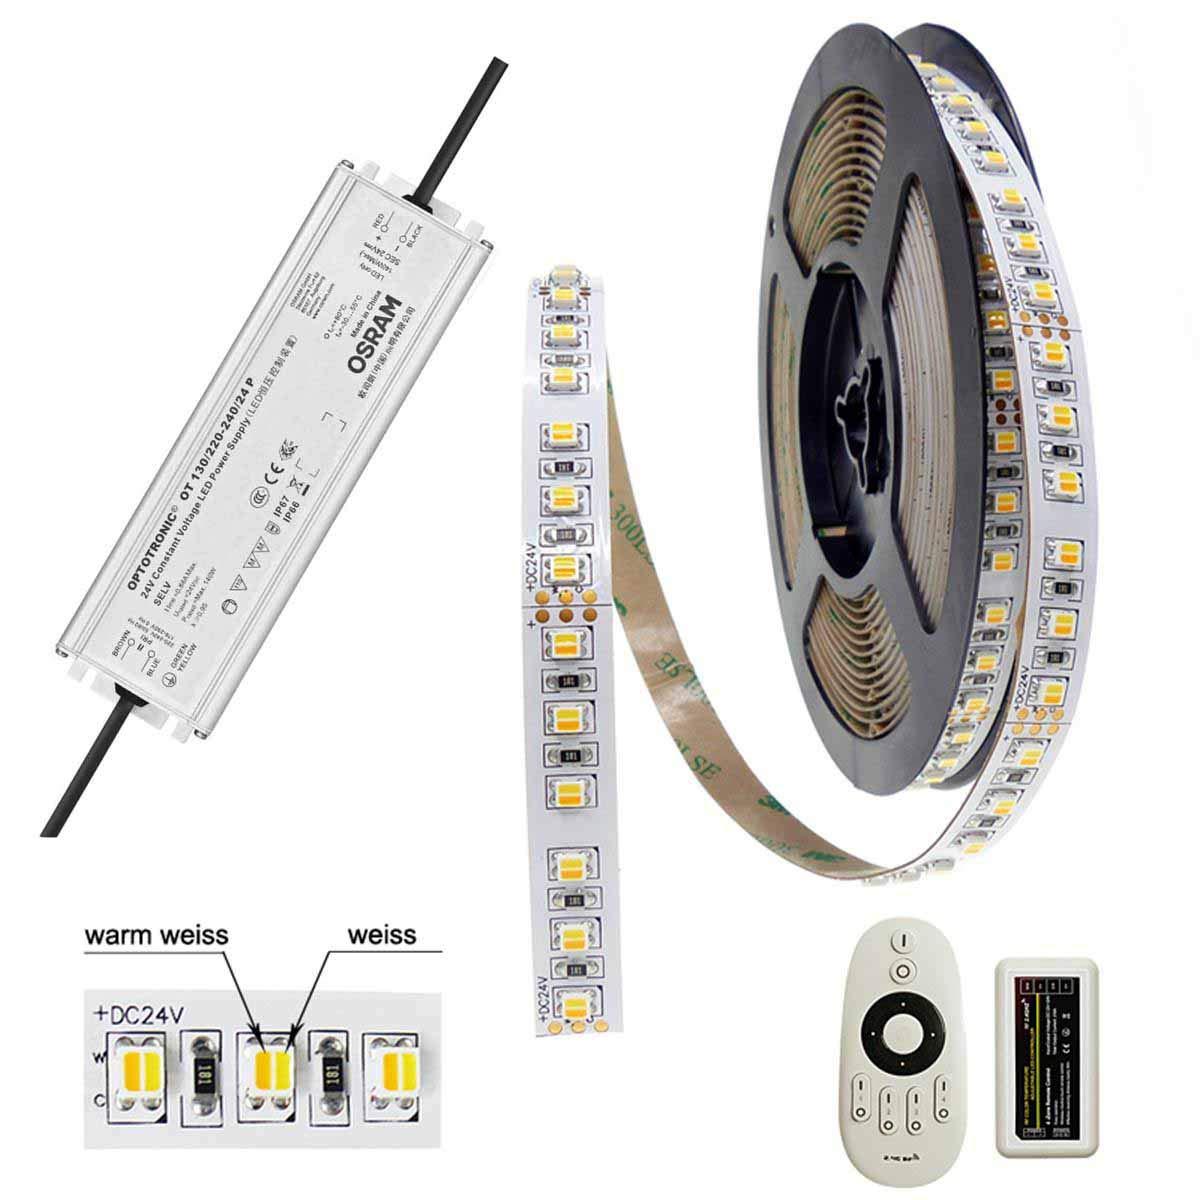 BRILEDA® CCT LED-STREIFEN SET Tunable Weiß 600 LED 5m 90Ra OSRAM Trafo 24V 130W